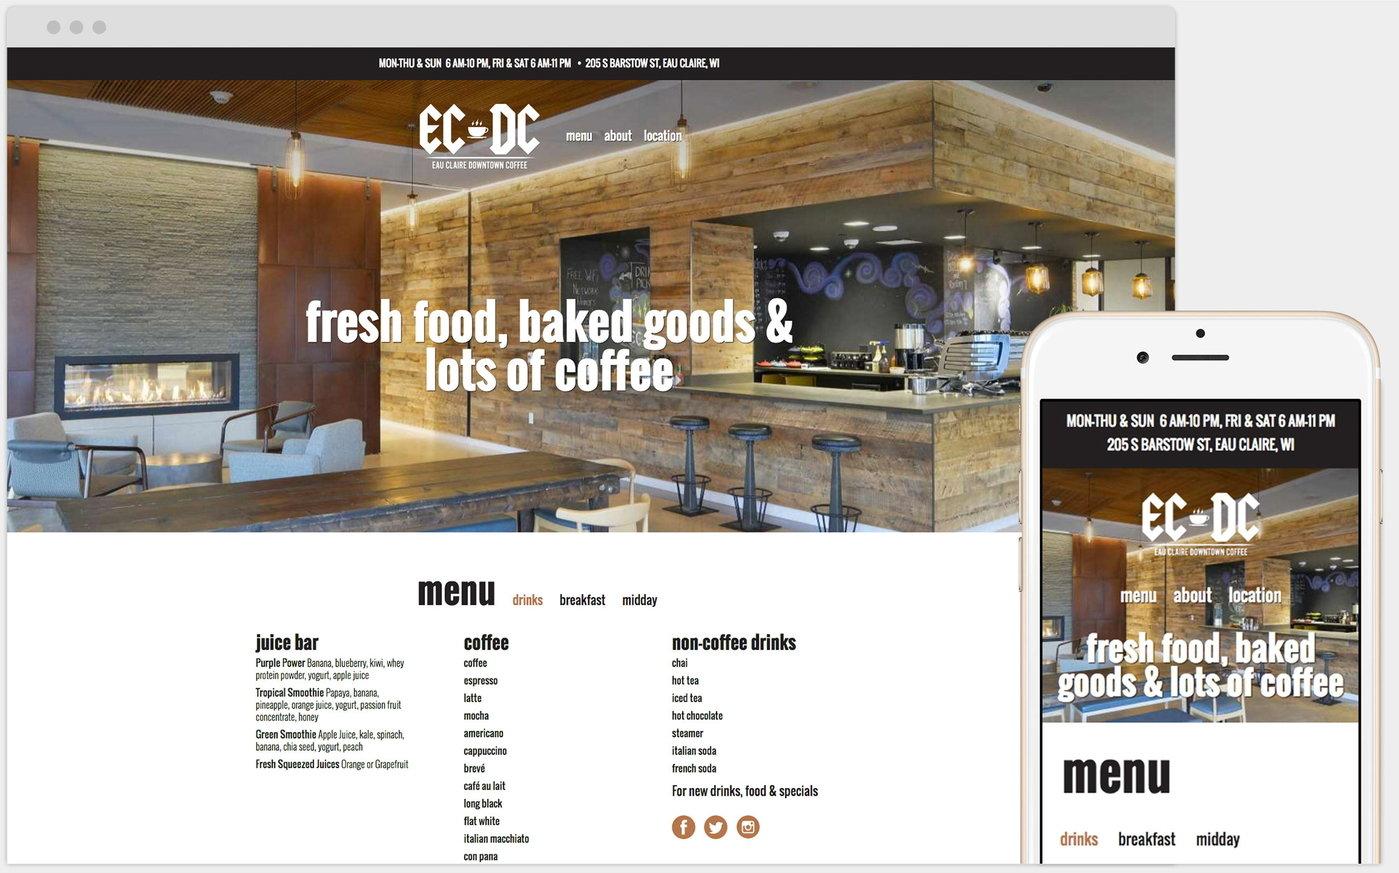 Eau Claire Downtown Coffee Ecdc By Sarah Shuda At Coroflot Com